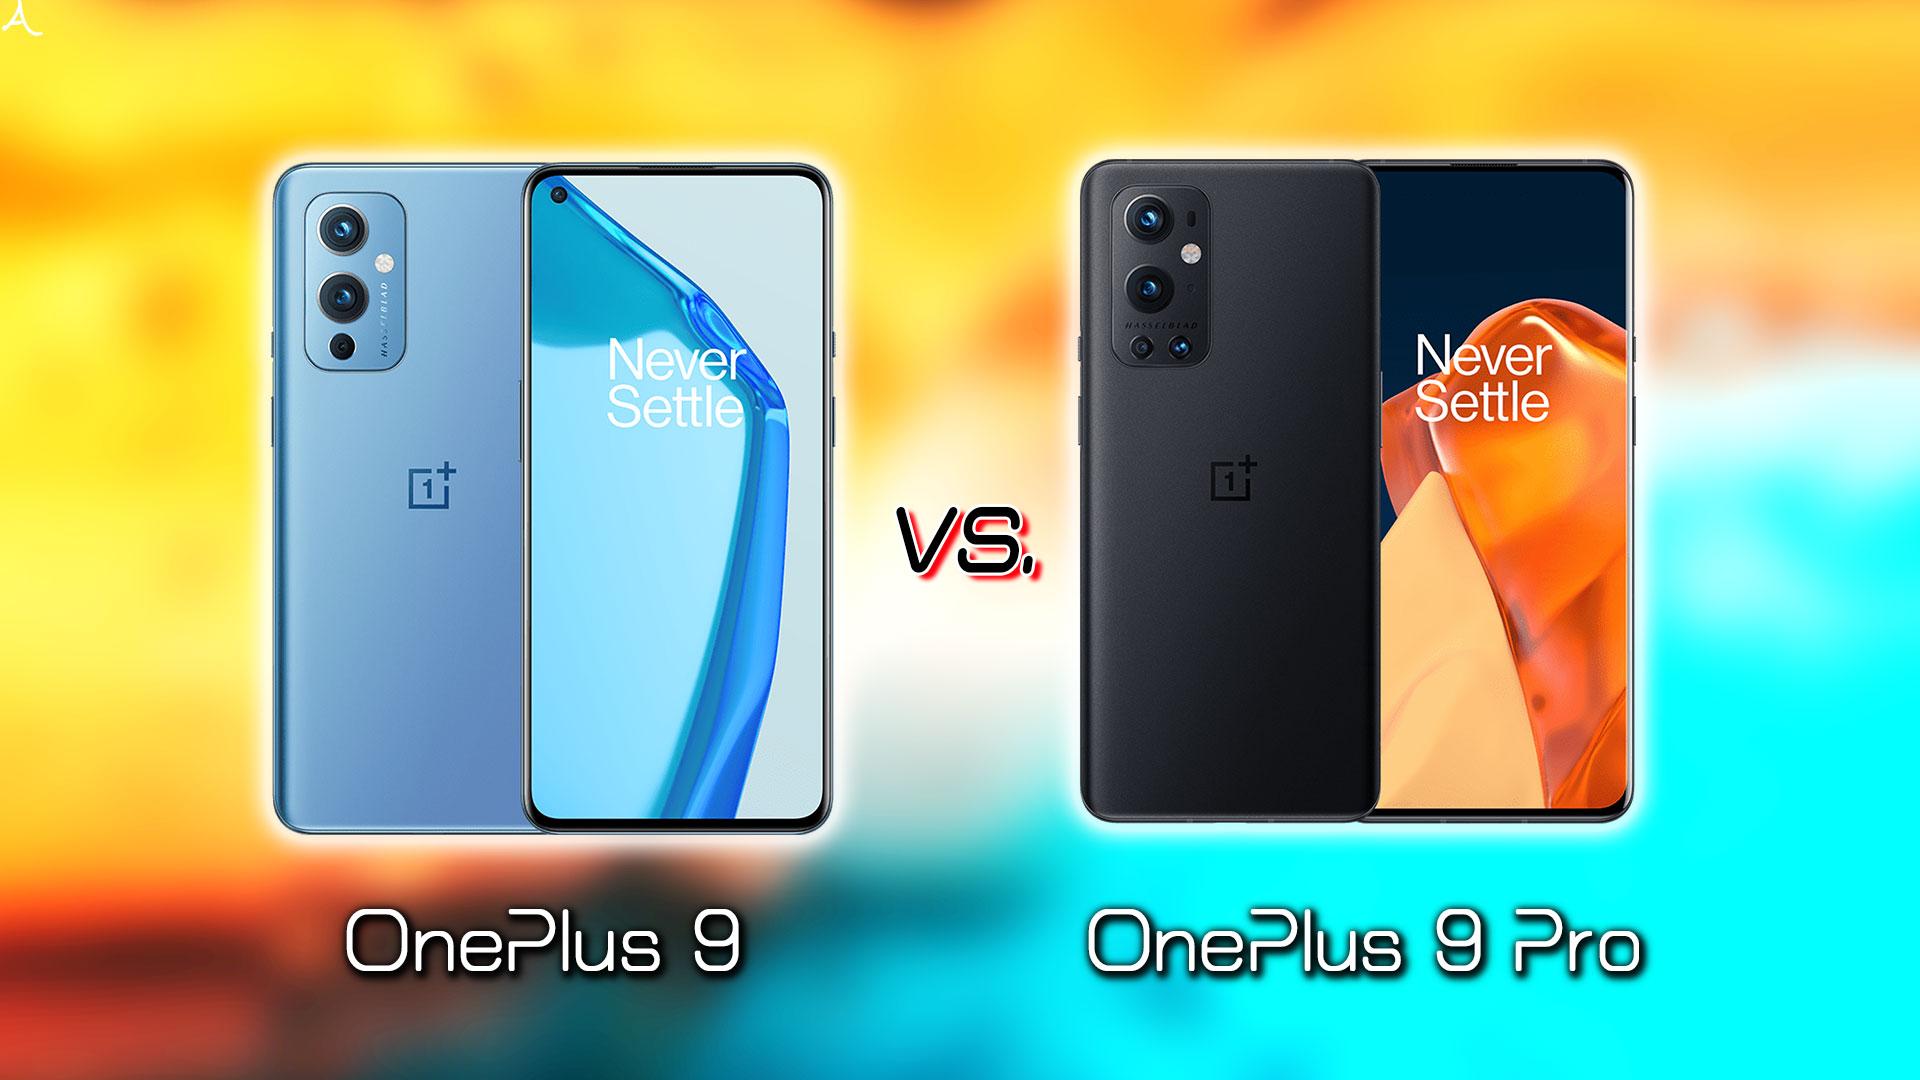 「OnePlus 9」と「OnePlus 9 Pro」の違いを比較:どっちを買う?